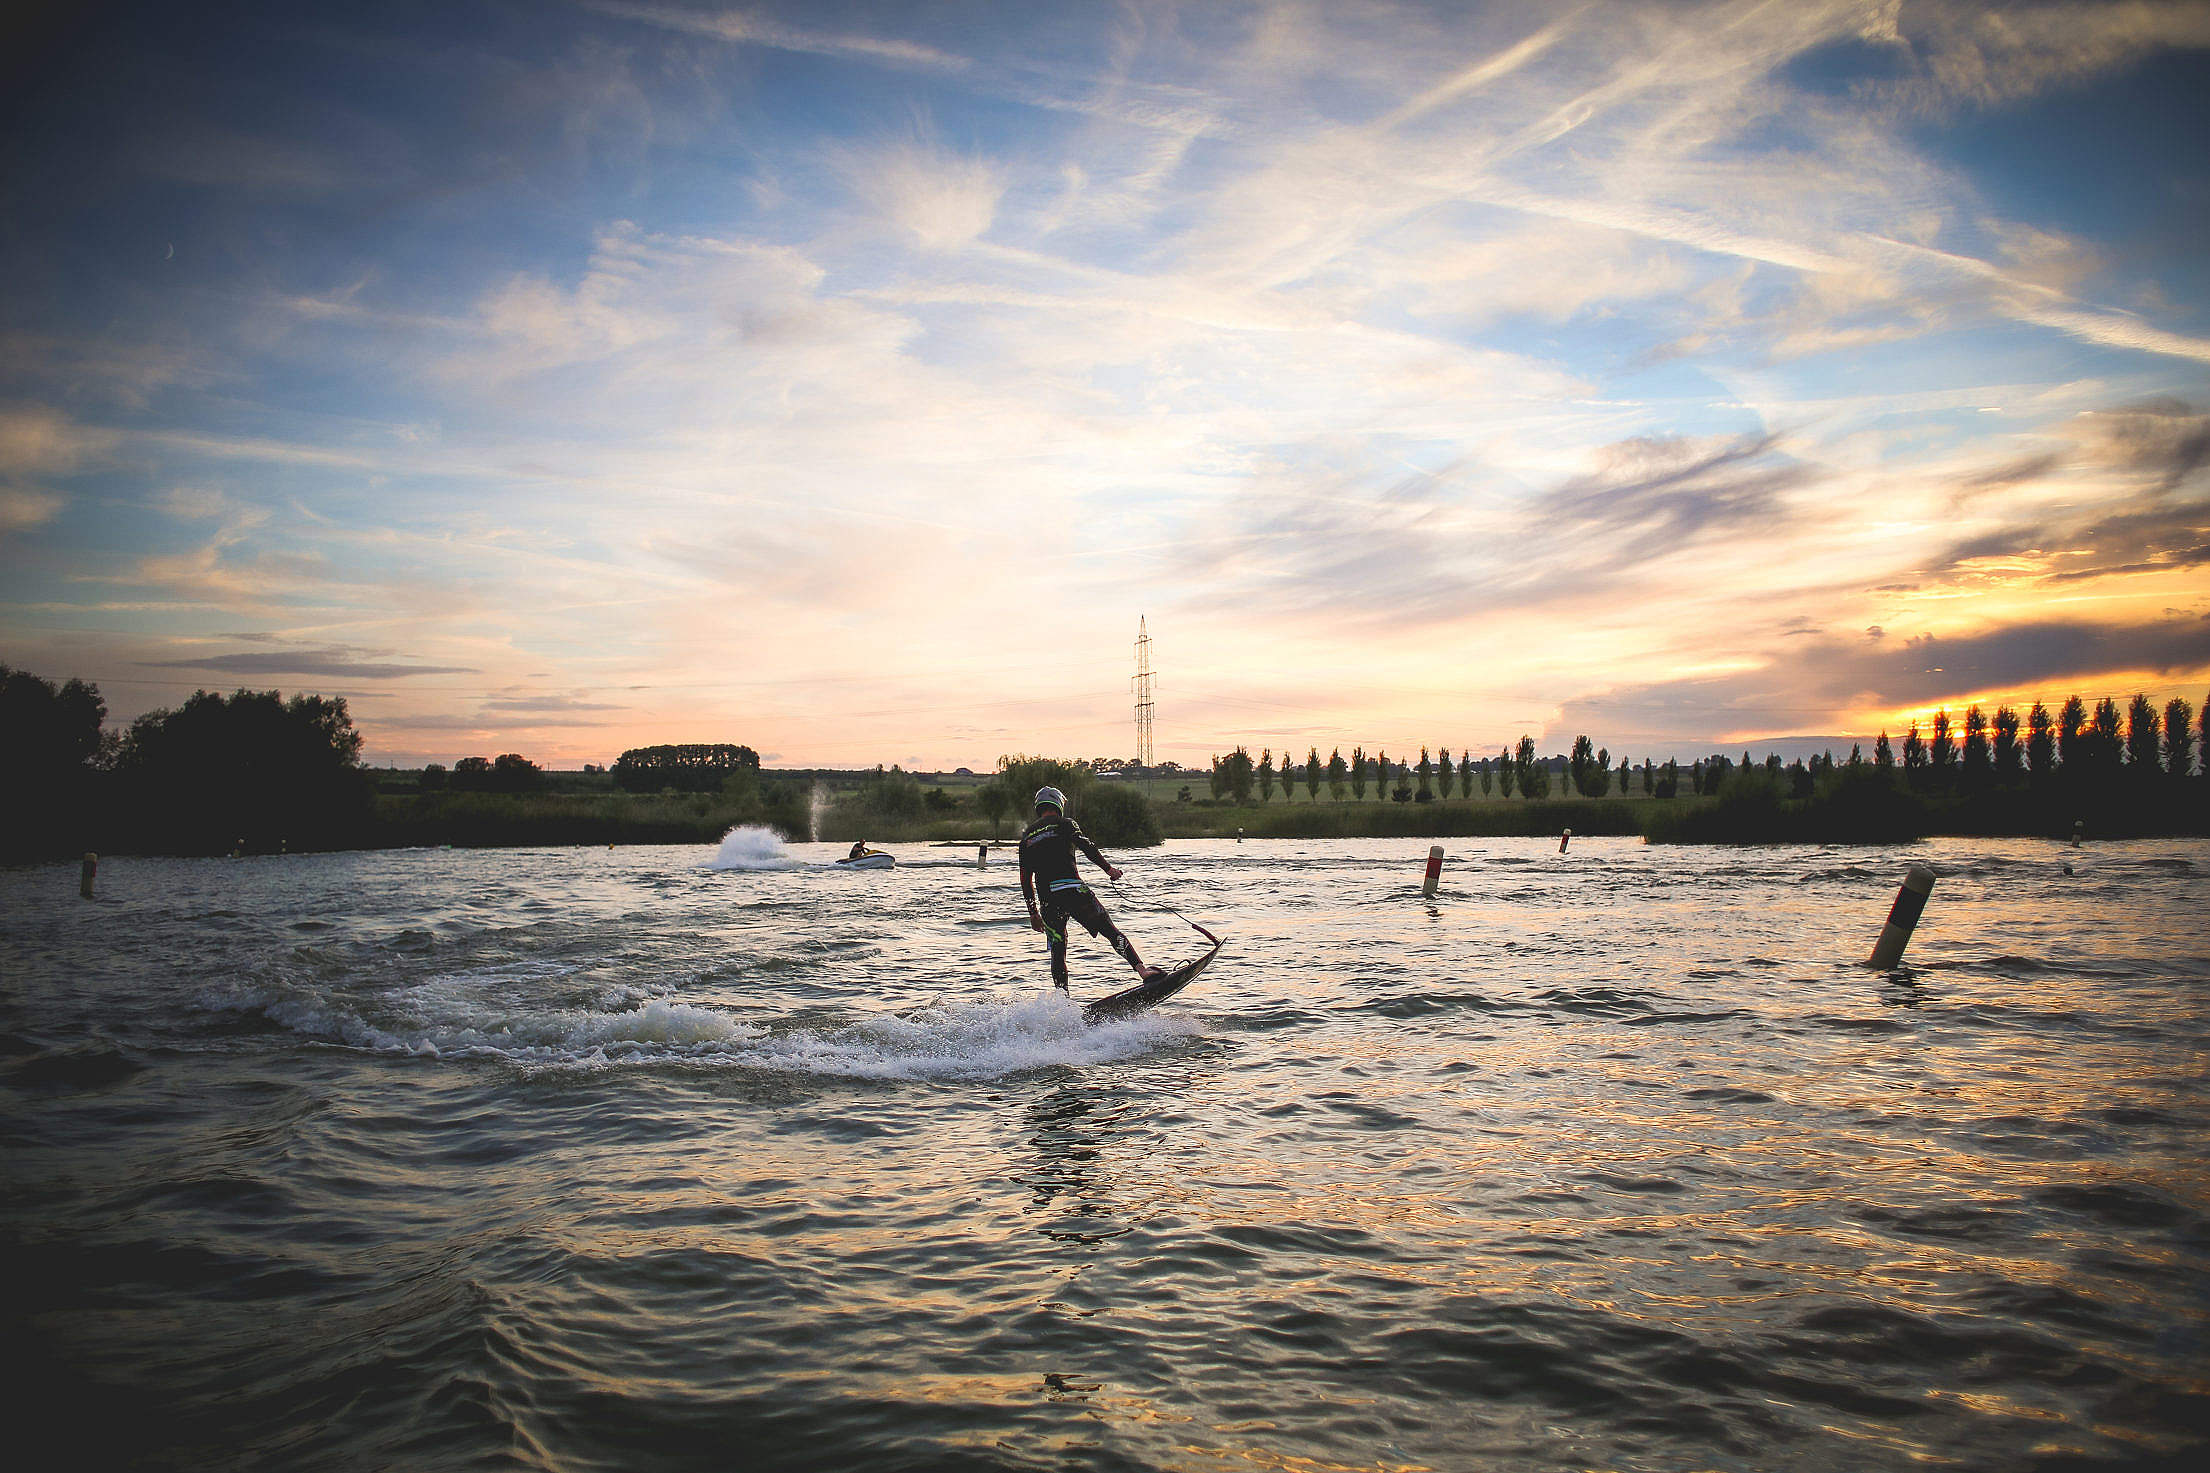 JetSurf Water Sports Fun Free Stock Photo